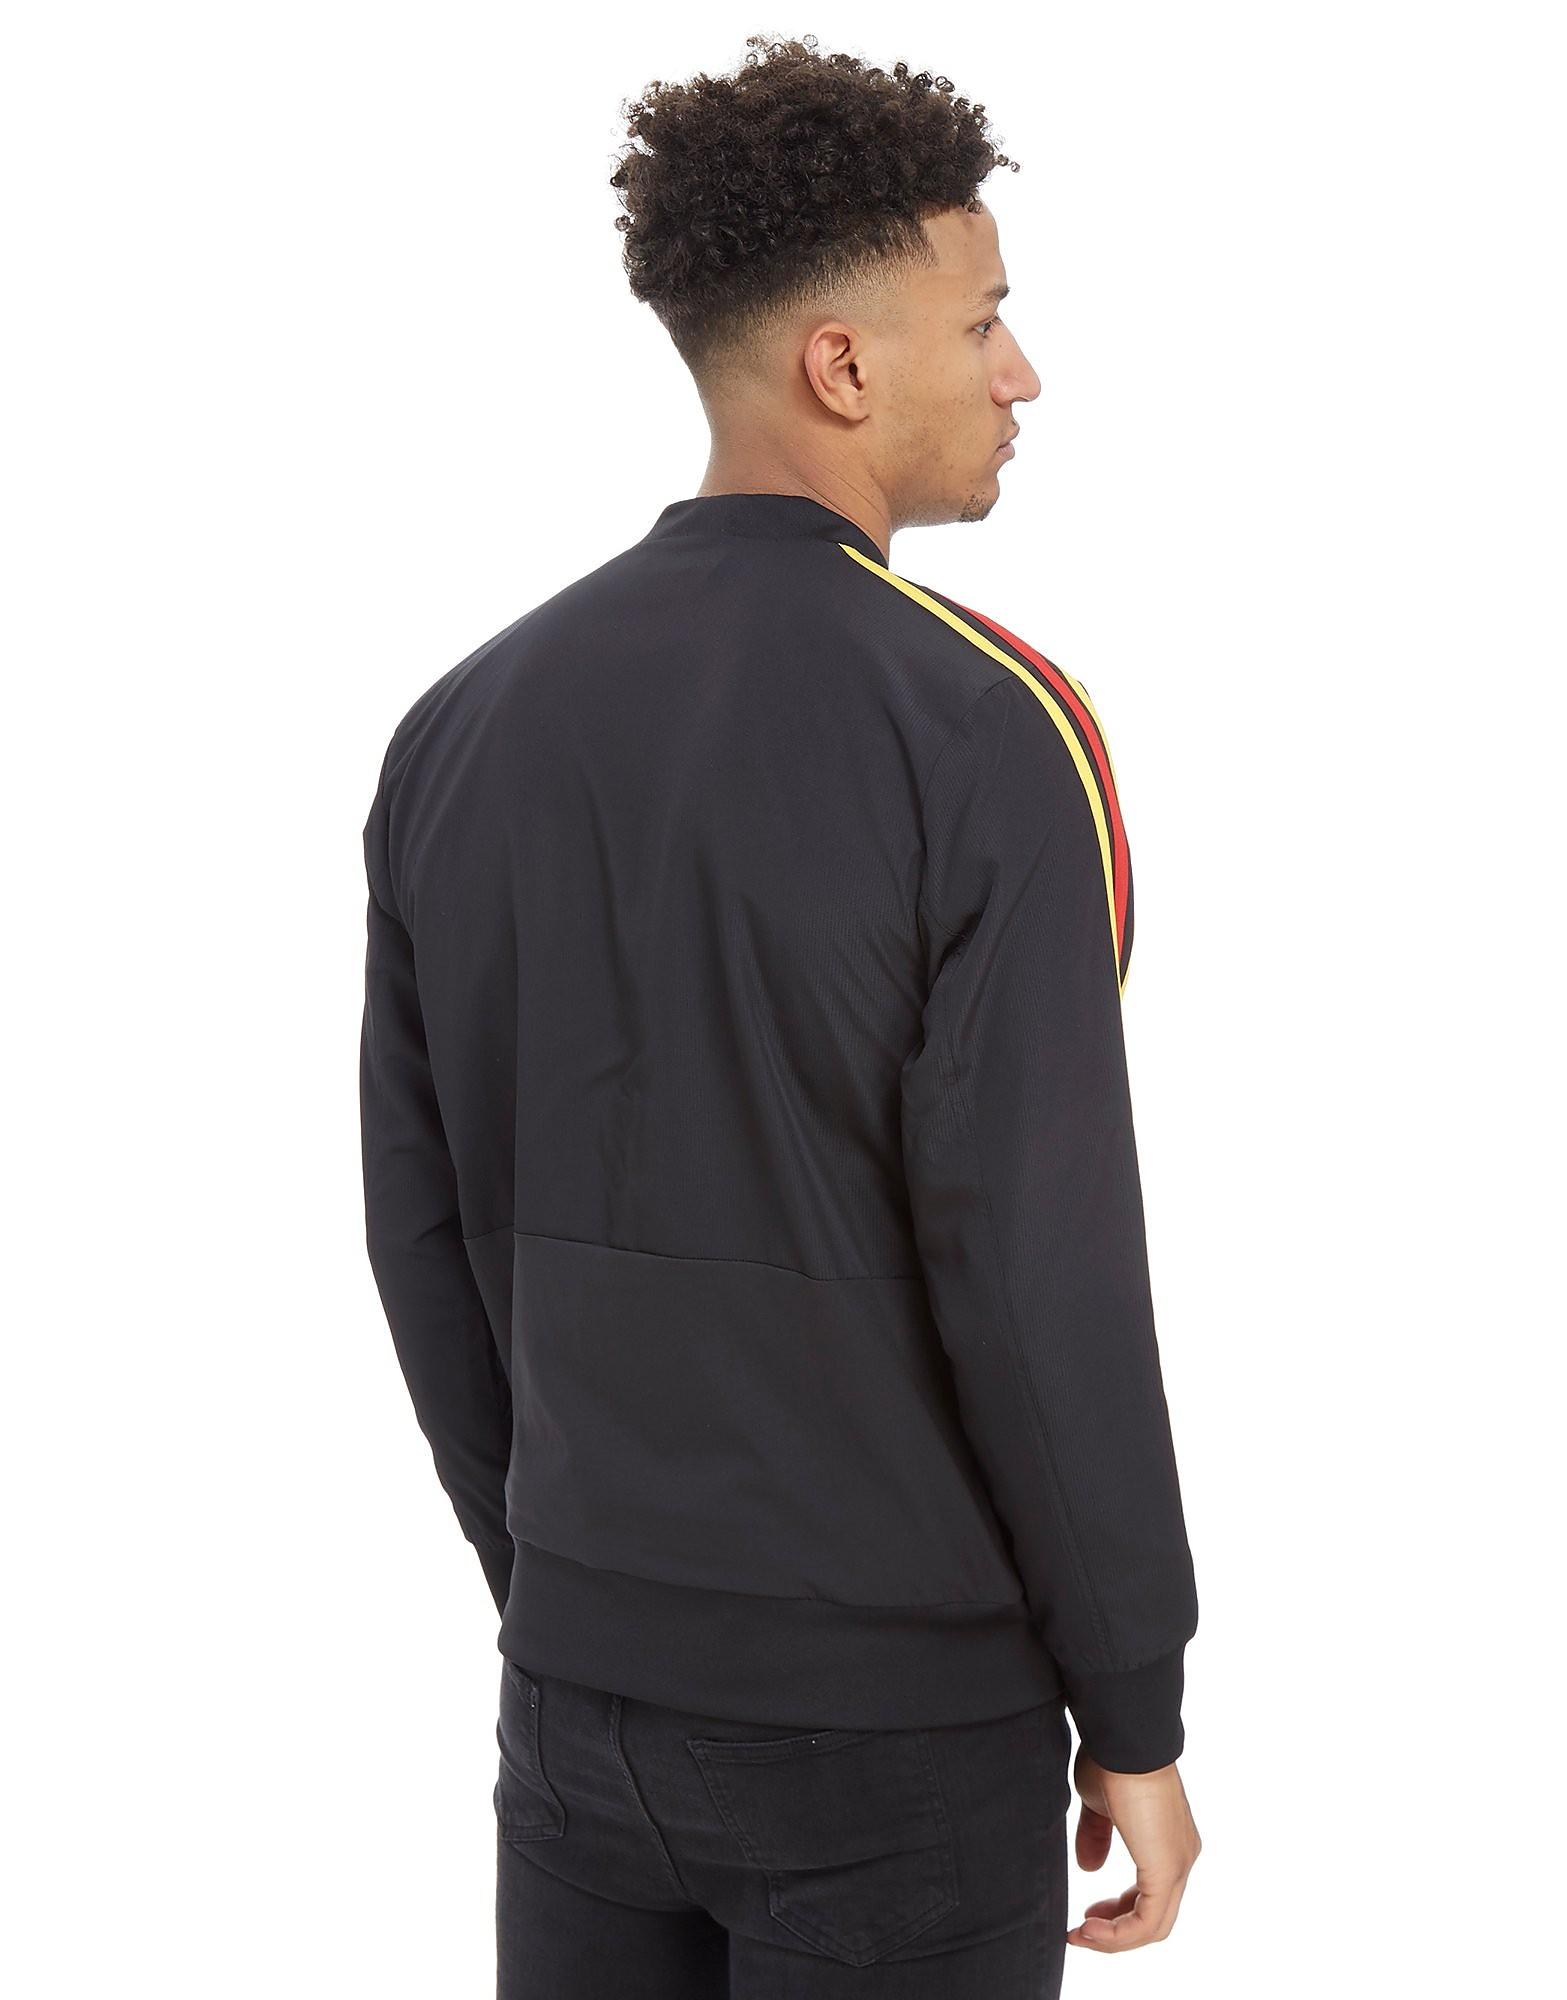 adidas Belgium 2018 Presentation Jacket